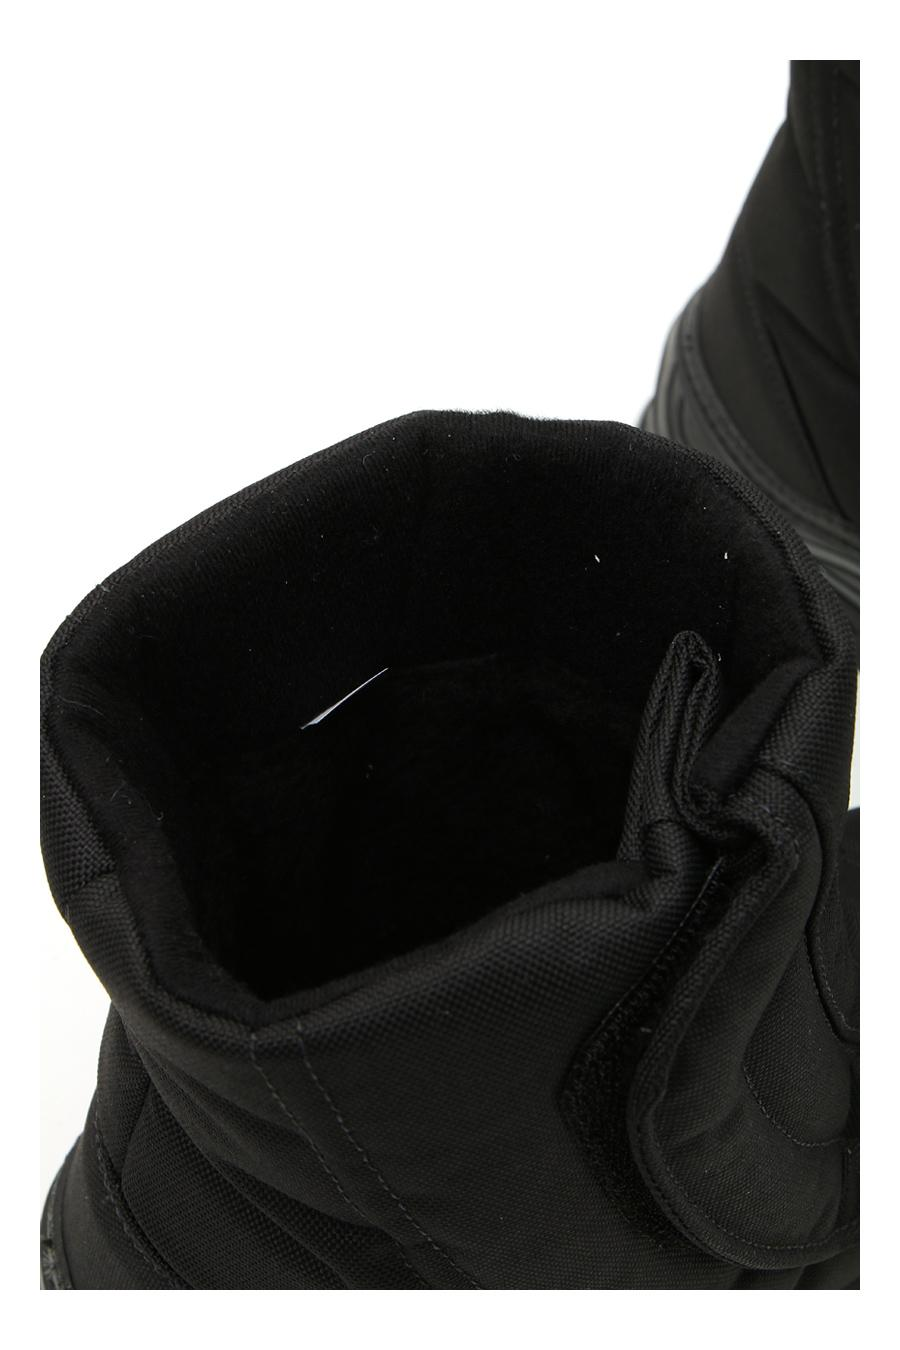 DOPOSCI ANTARCTICA 2386 uomo nero | Pittarello